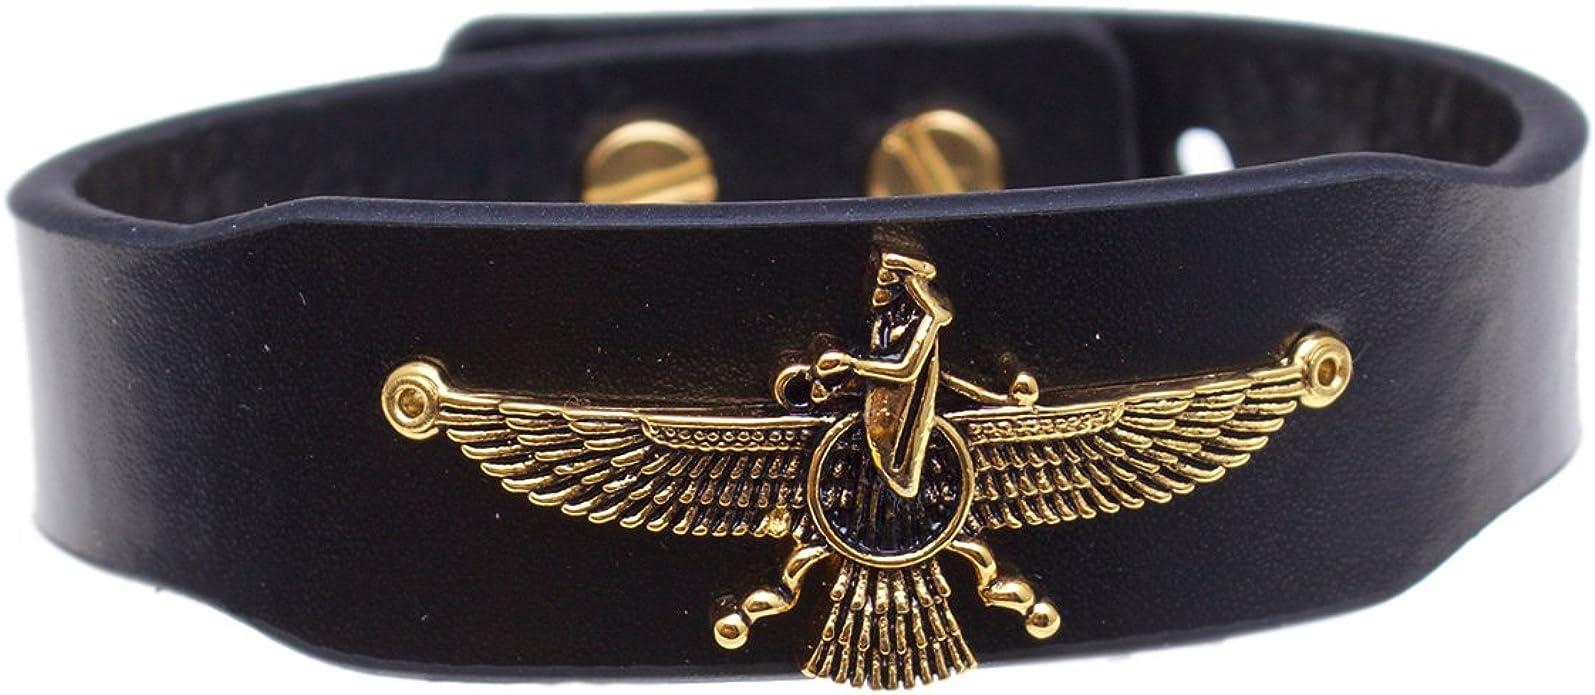 Unisex Persian Zoroastrian Farvahar Farohar Leather Bracelet Persia Gift Art